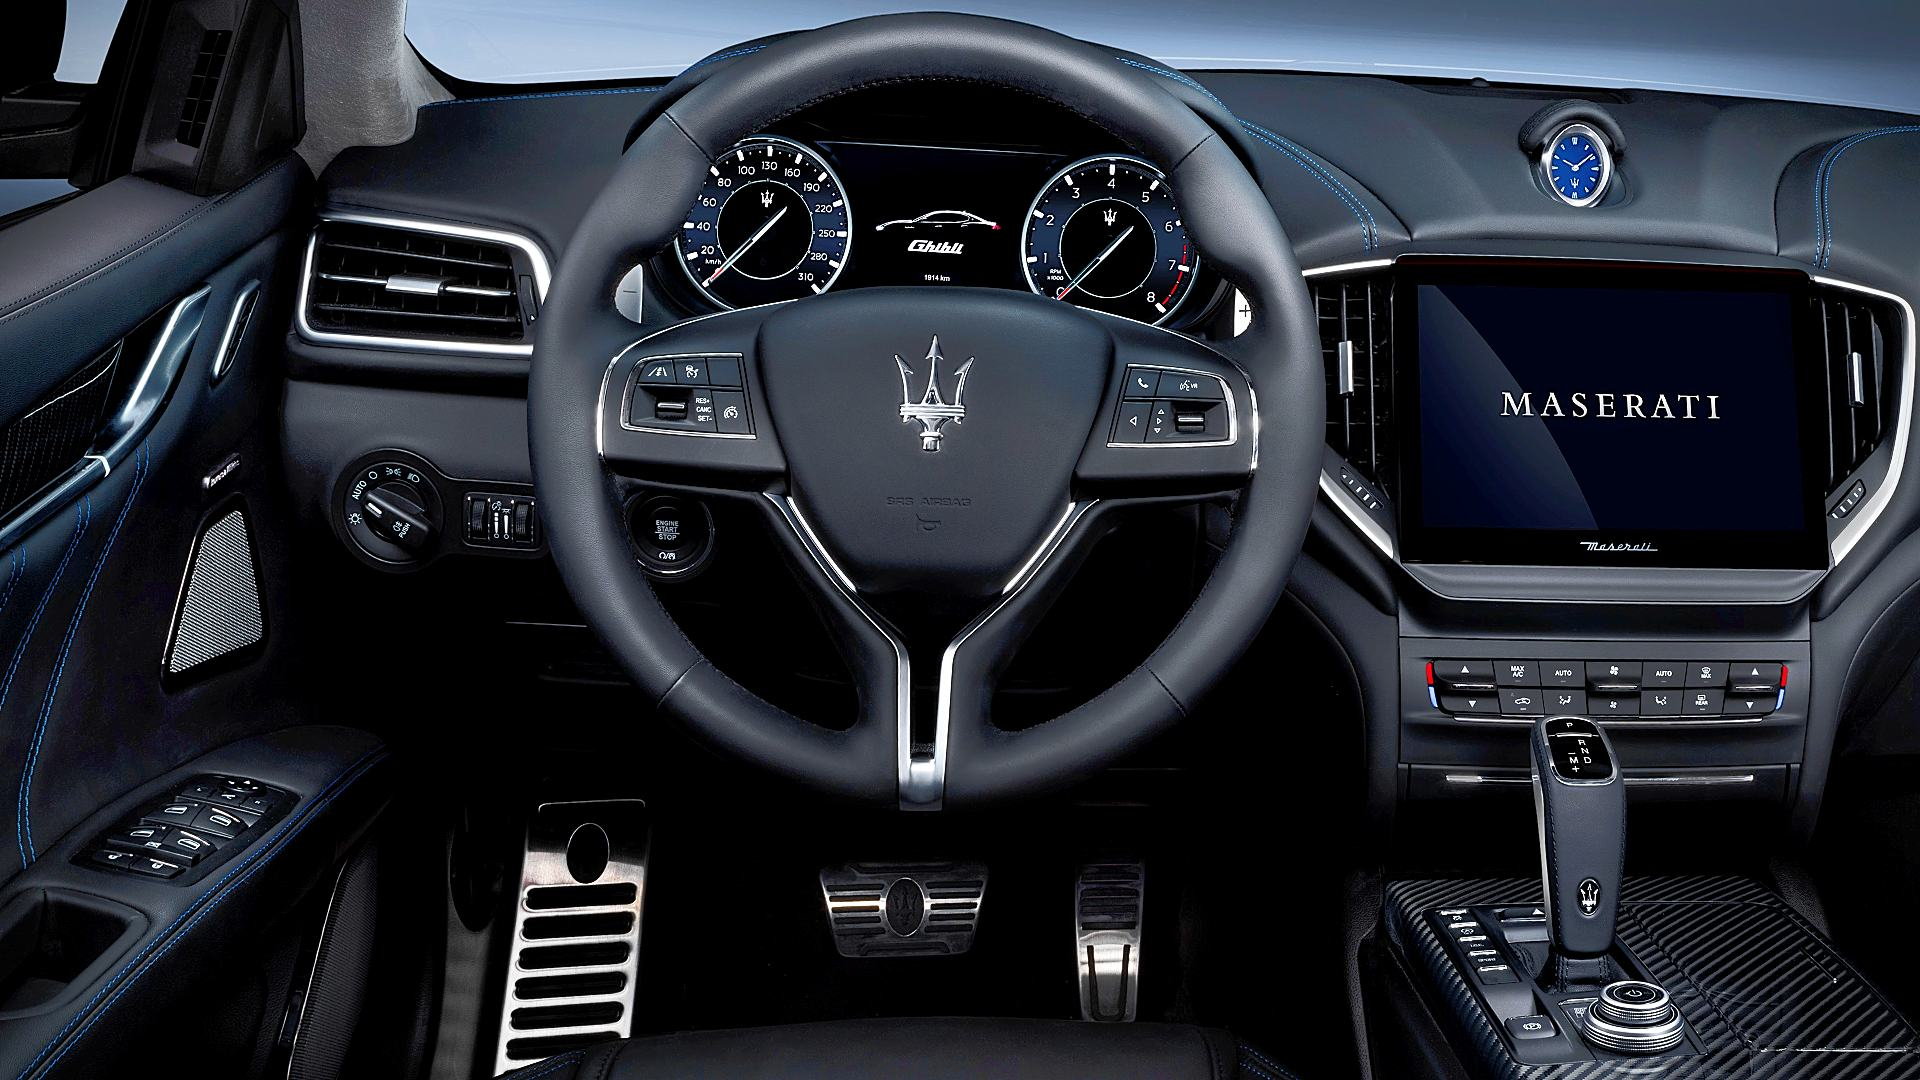 2021 Maserati Ghibli Interior Inside